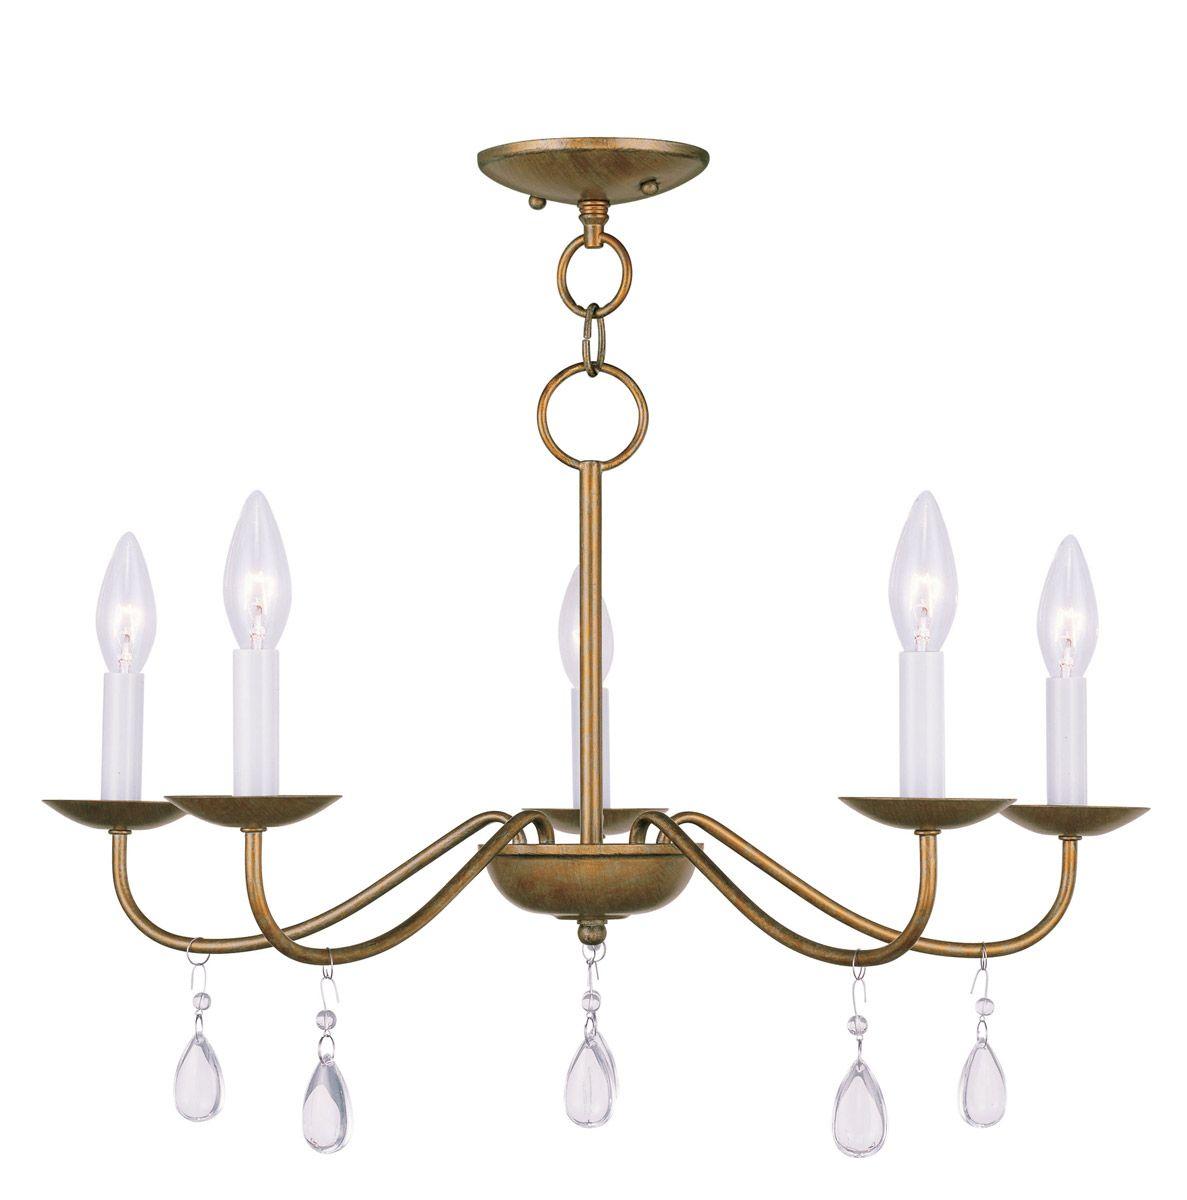 Livex 4845 48 mercer 5 light 24 inch antique gold leaf chandelier livex 4845 48 mercer 5 light 24 inch antique gold leaf chandelier ceiling light arubaitofo Images